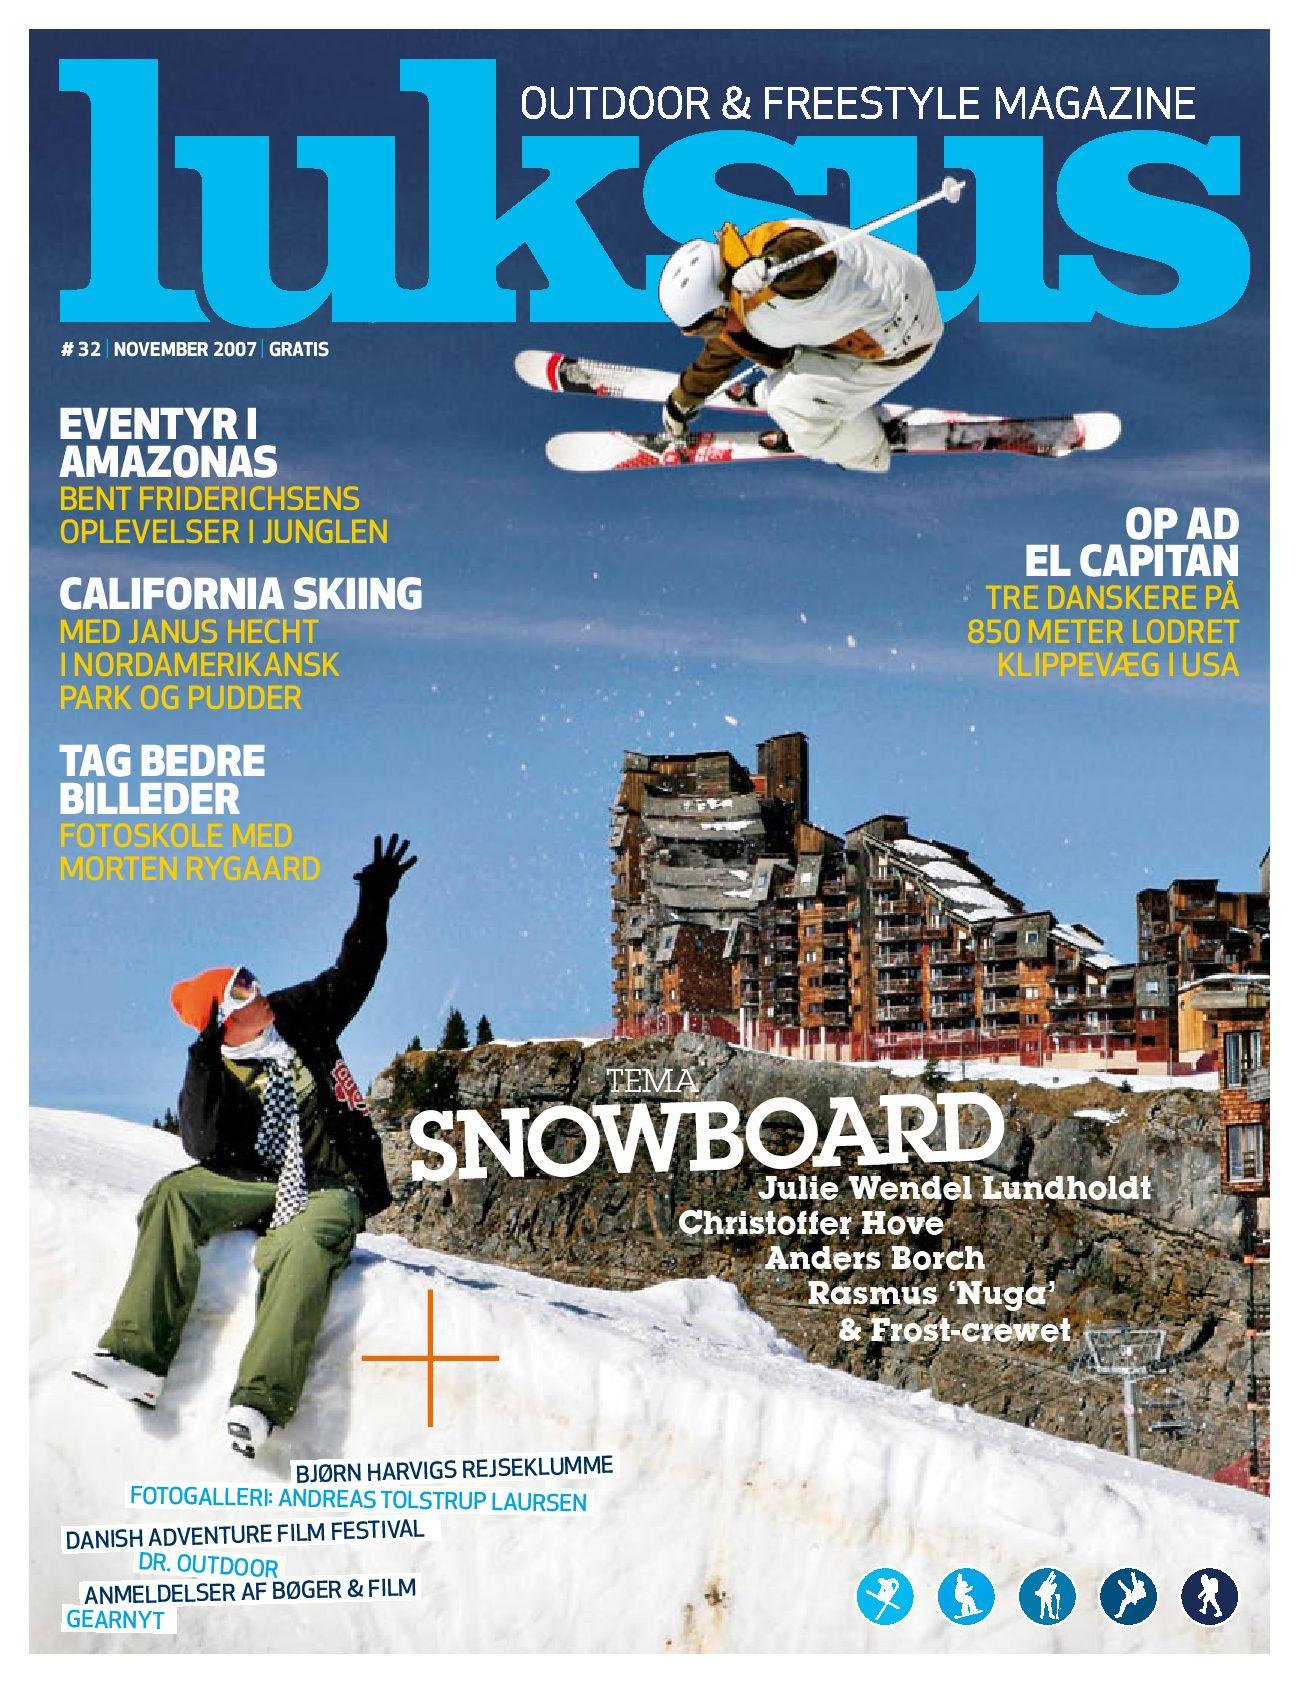 7776304ffe4 LUKSUS Outdoor & Freestyle Magazine # 32 by LUKSUS - issuu